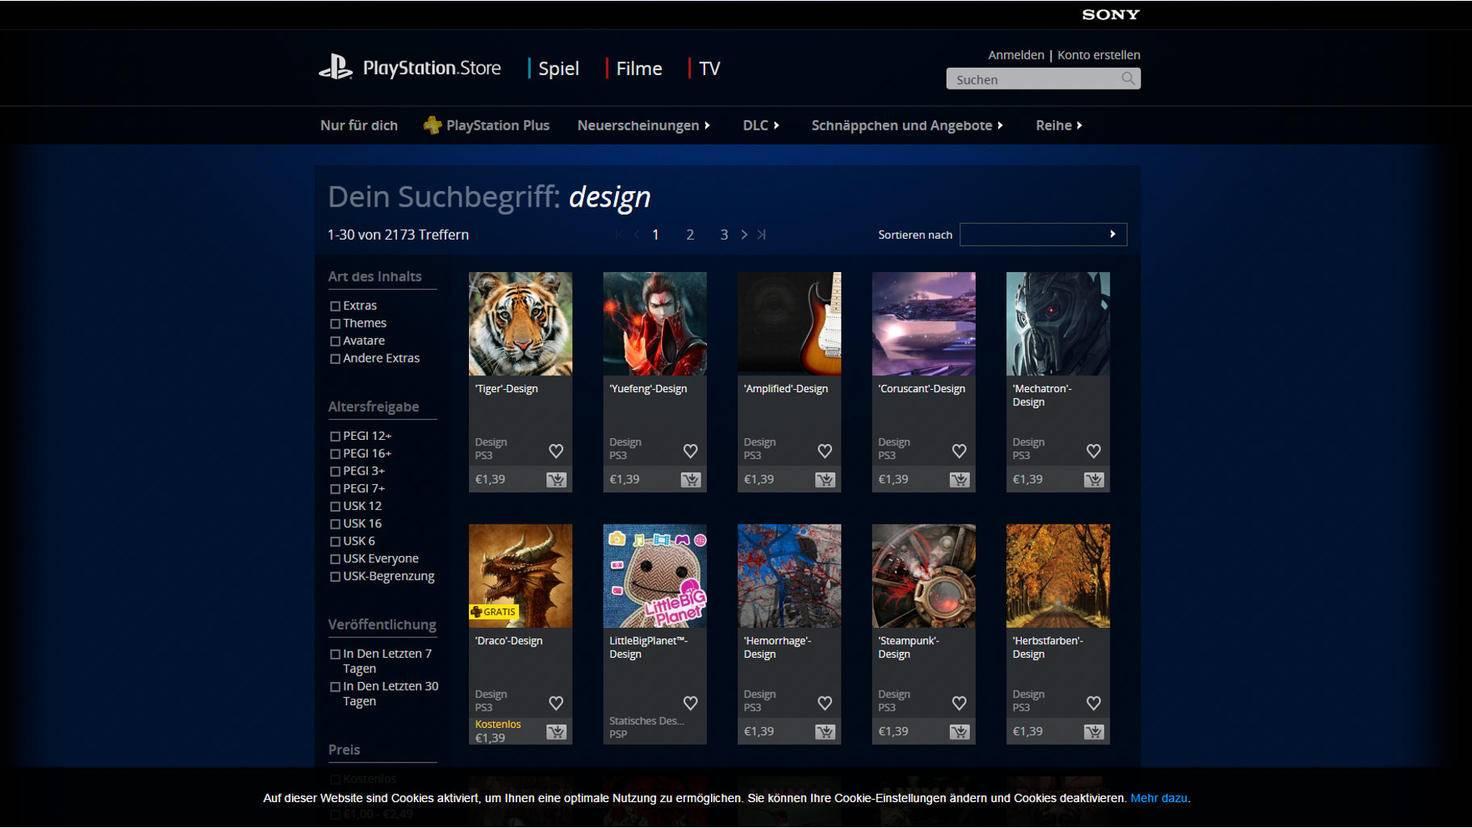 PS4 Design PlayStation Shop